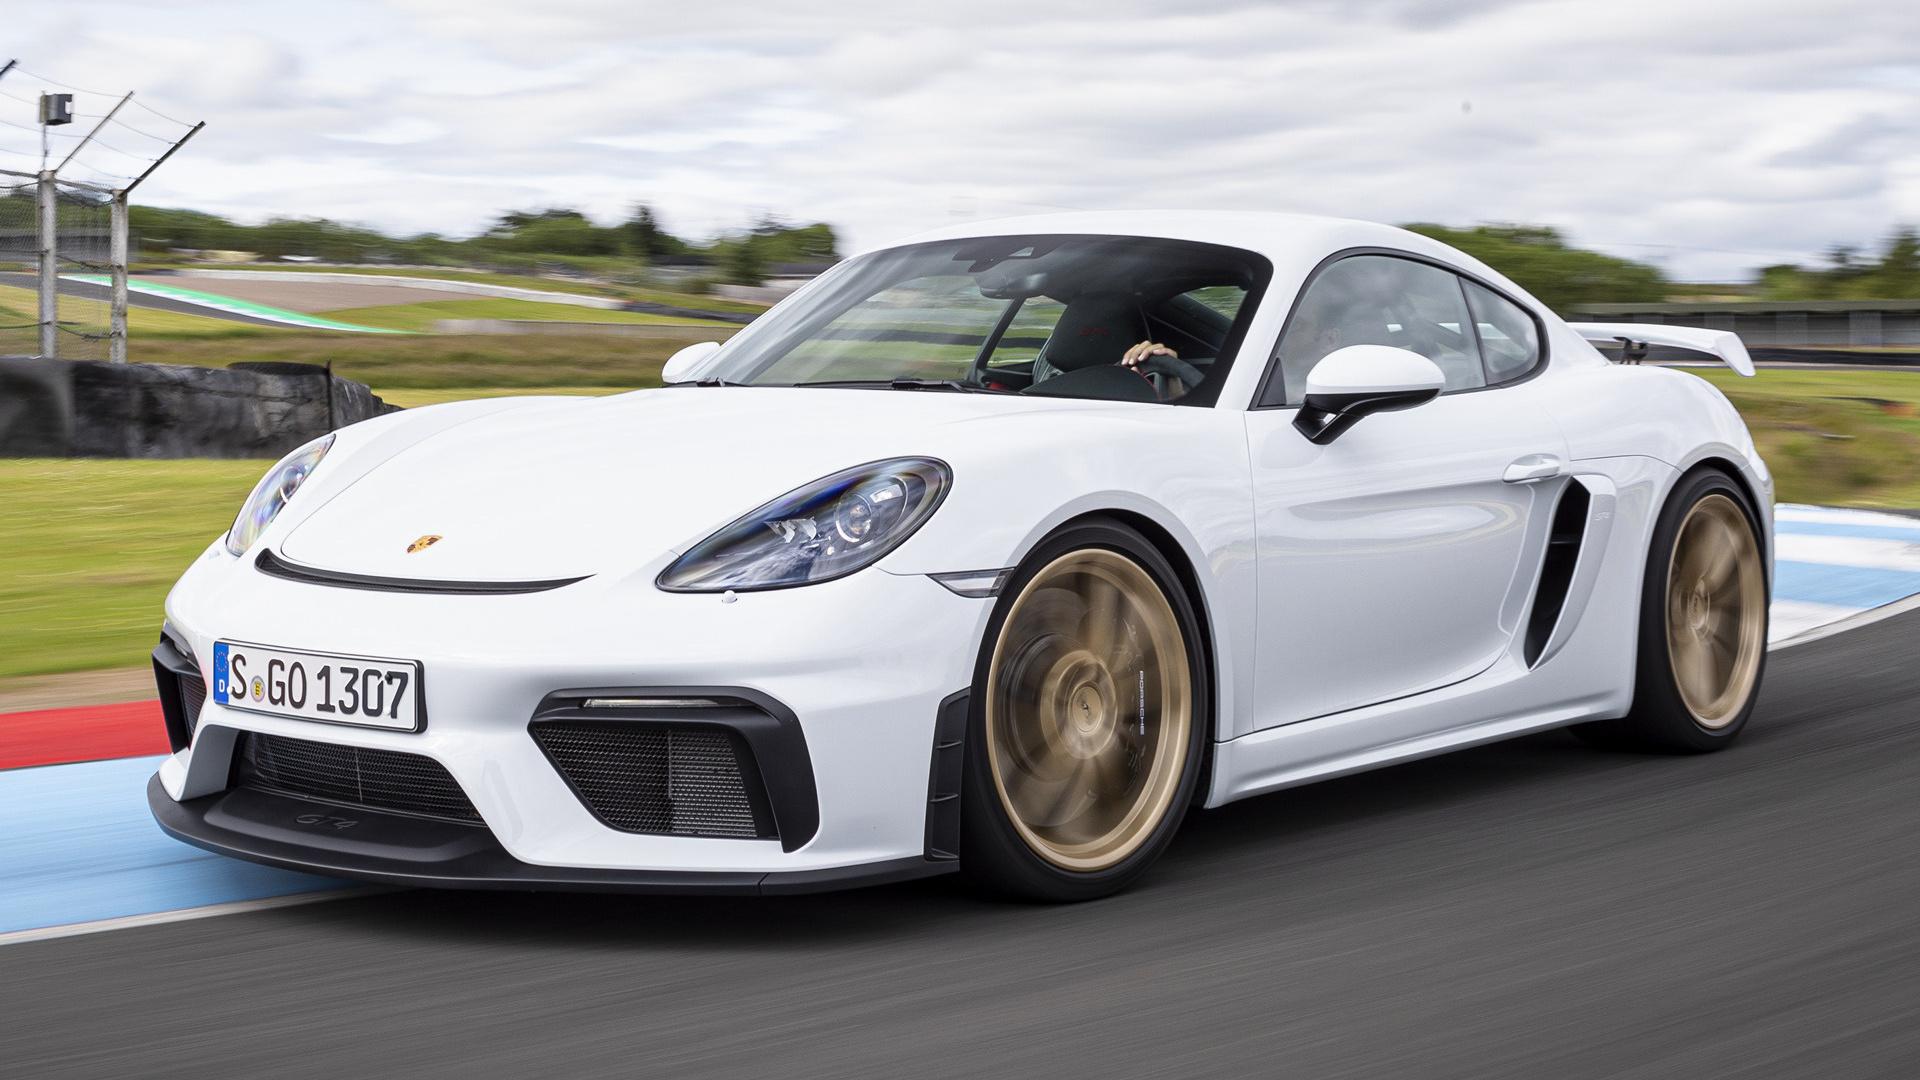 2019 Porsche 718 Cayman Gt4 Wallpapers And Hd Images Car Pixel